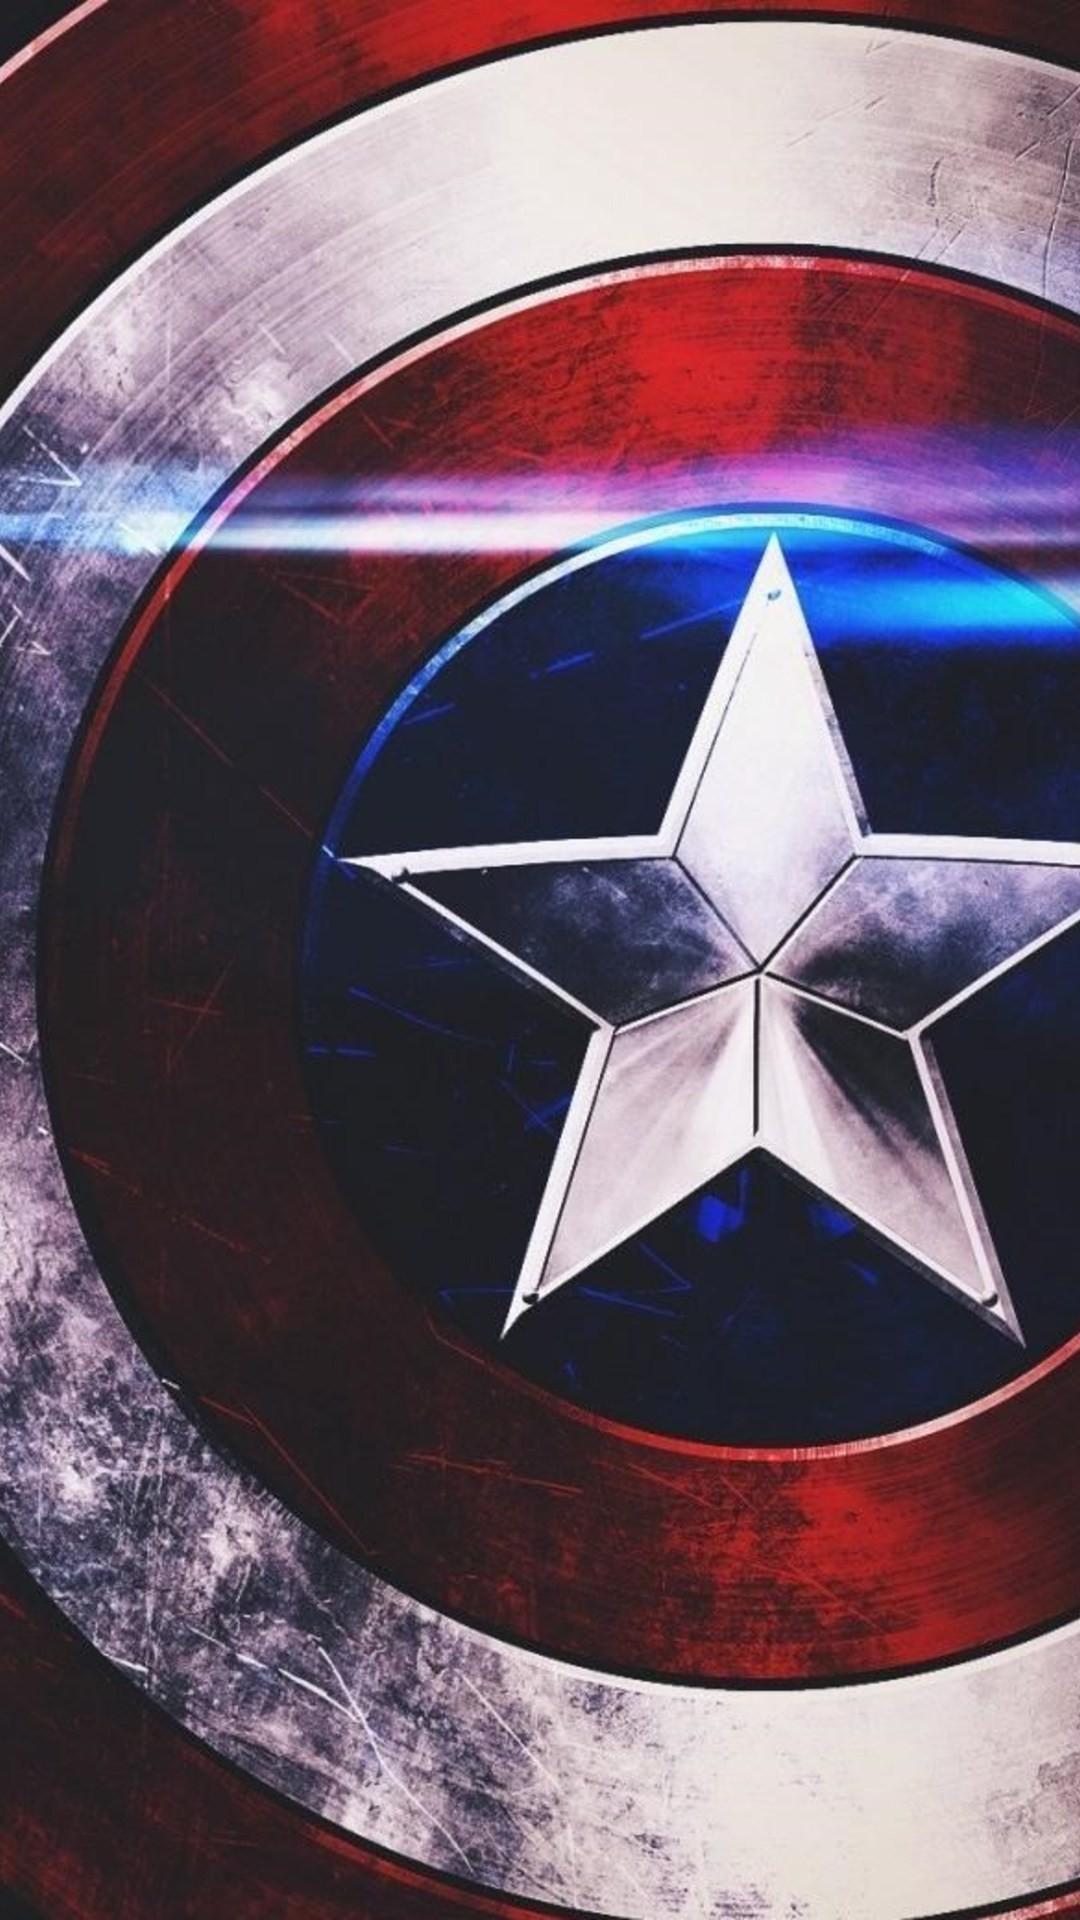 Captain America Shield Image Wallpaper 1080x1920   Walls wd 1080x1920